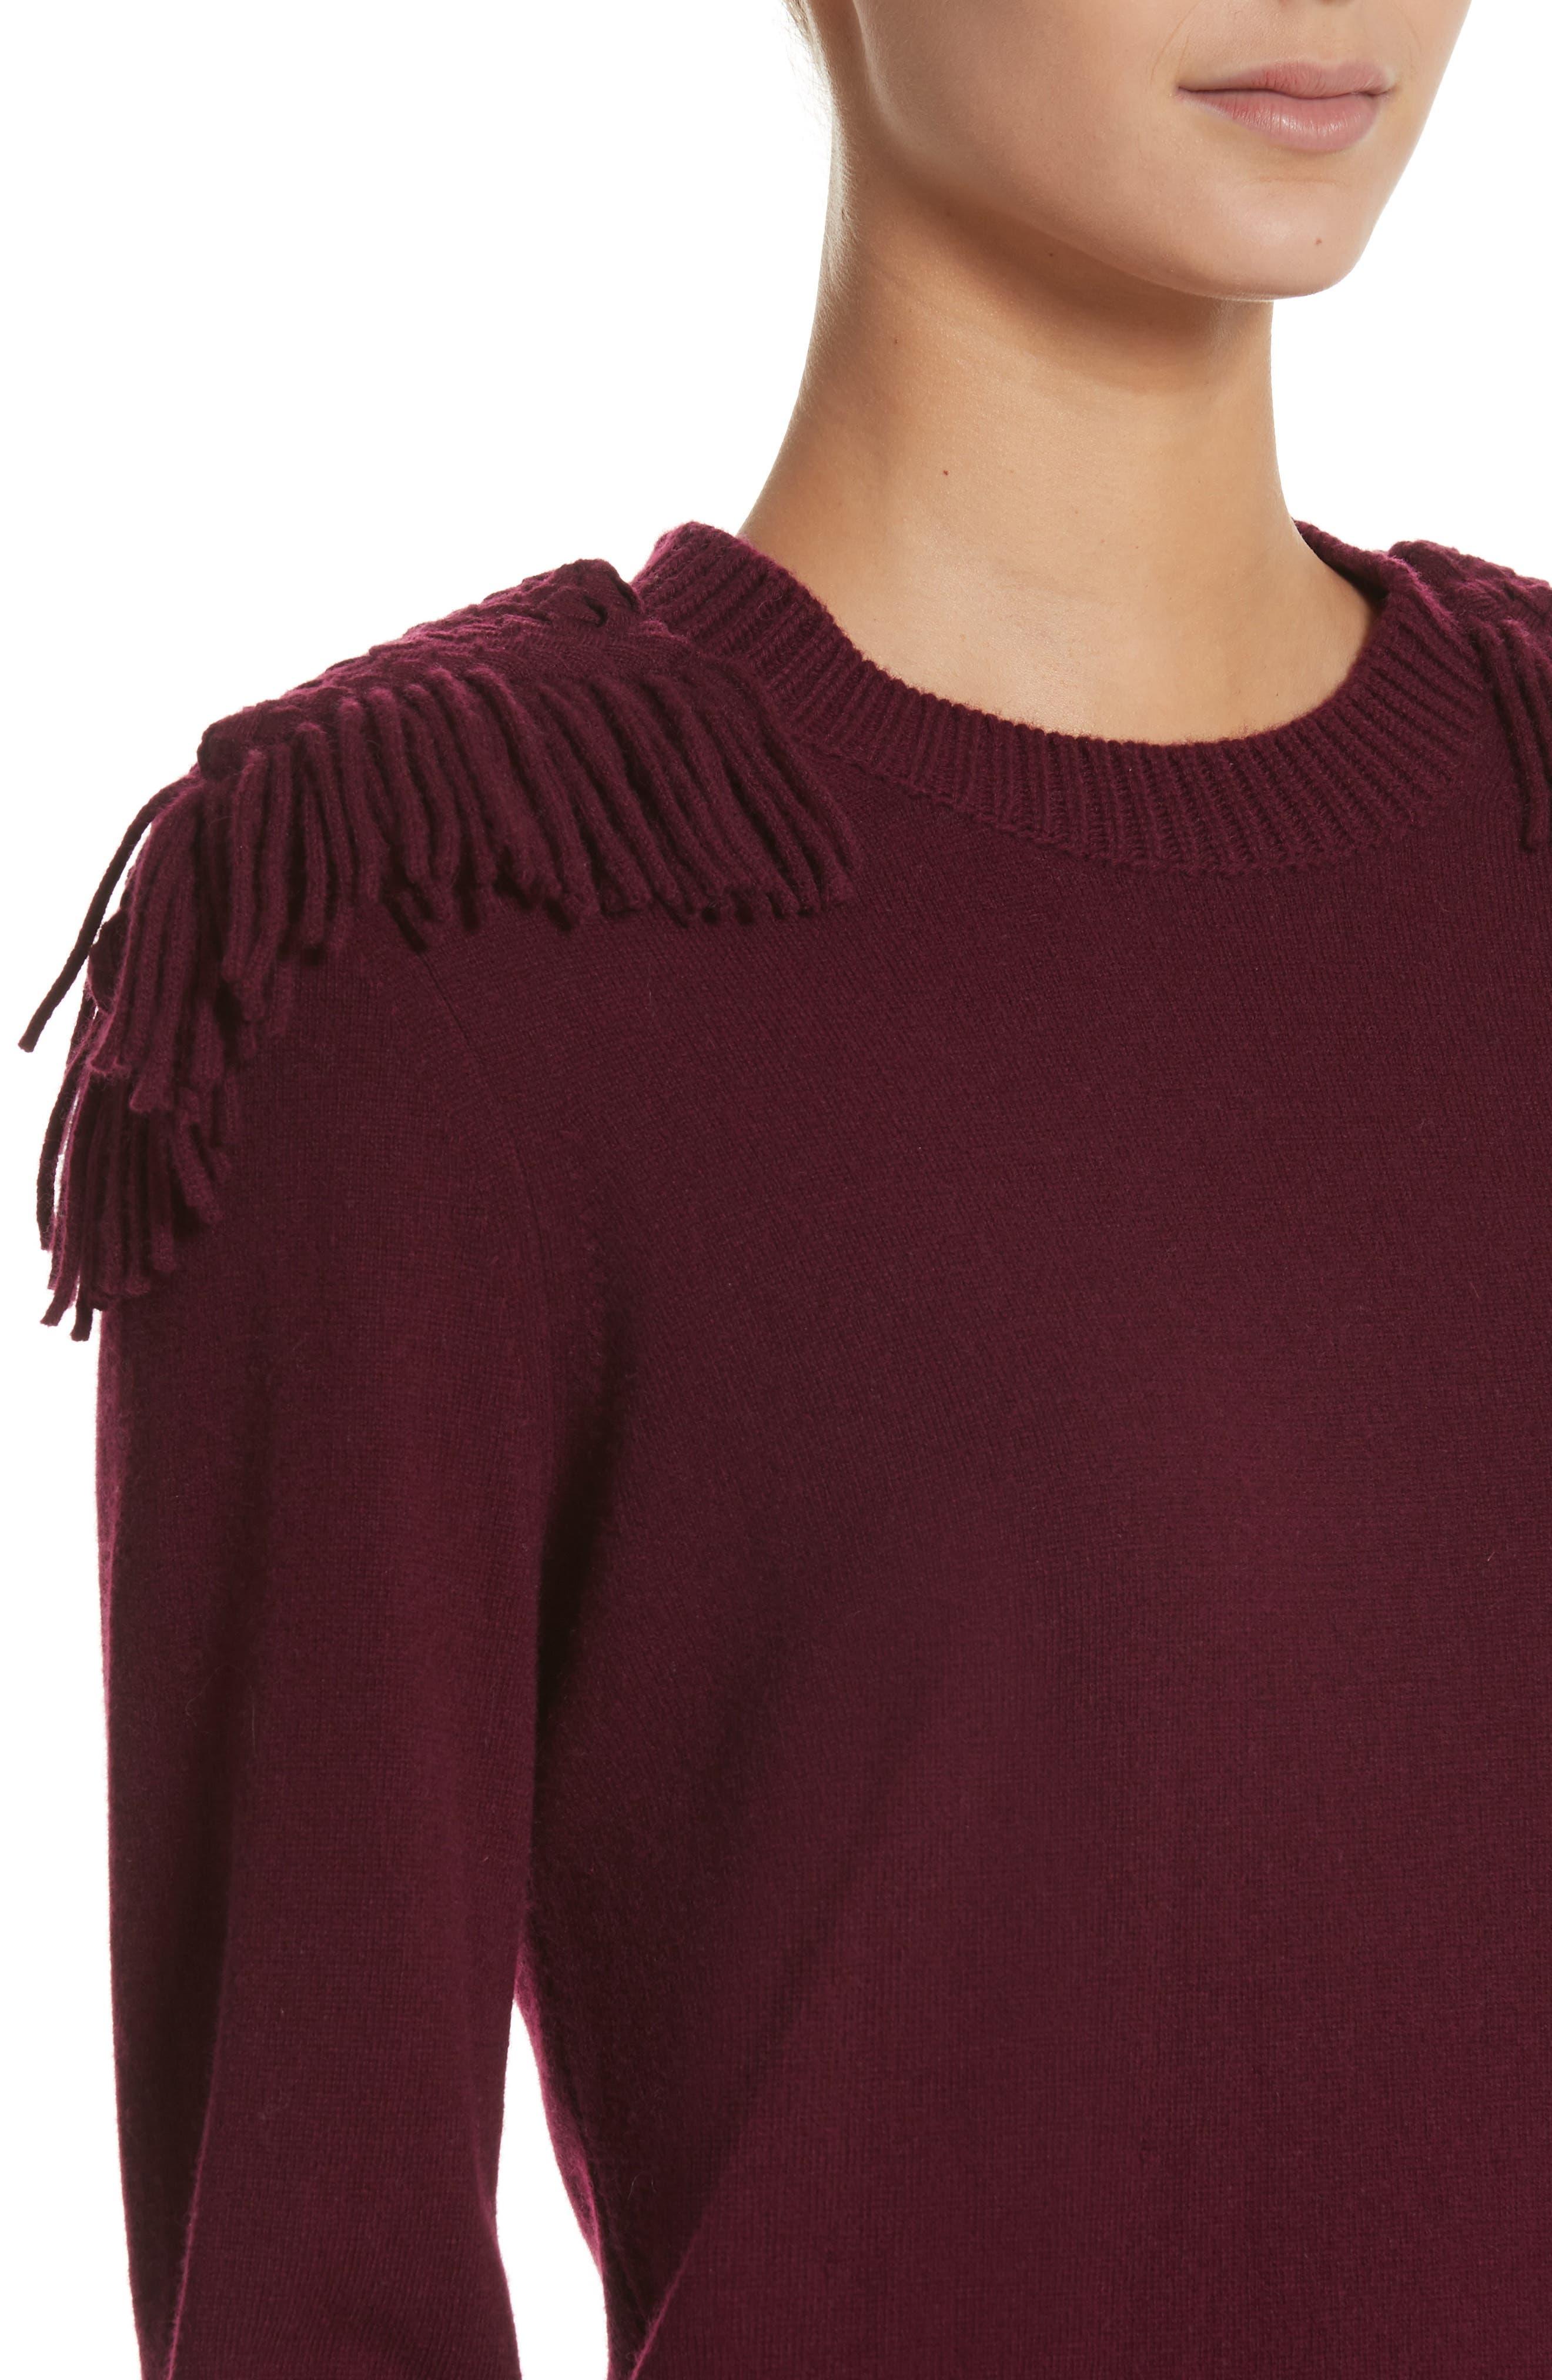 Neto Wool & Cashmere Fringe Sweater Dress,                             Alternate thumbnail 4, color,                             601